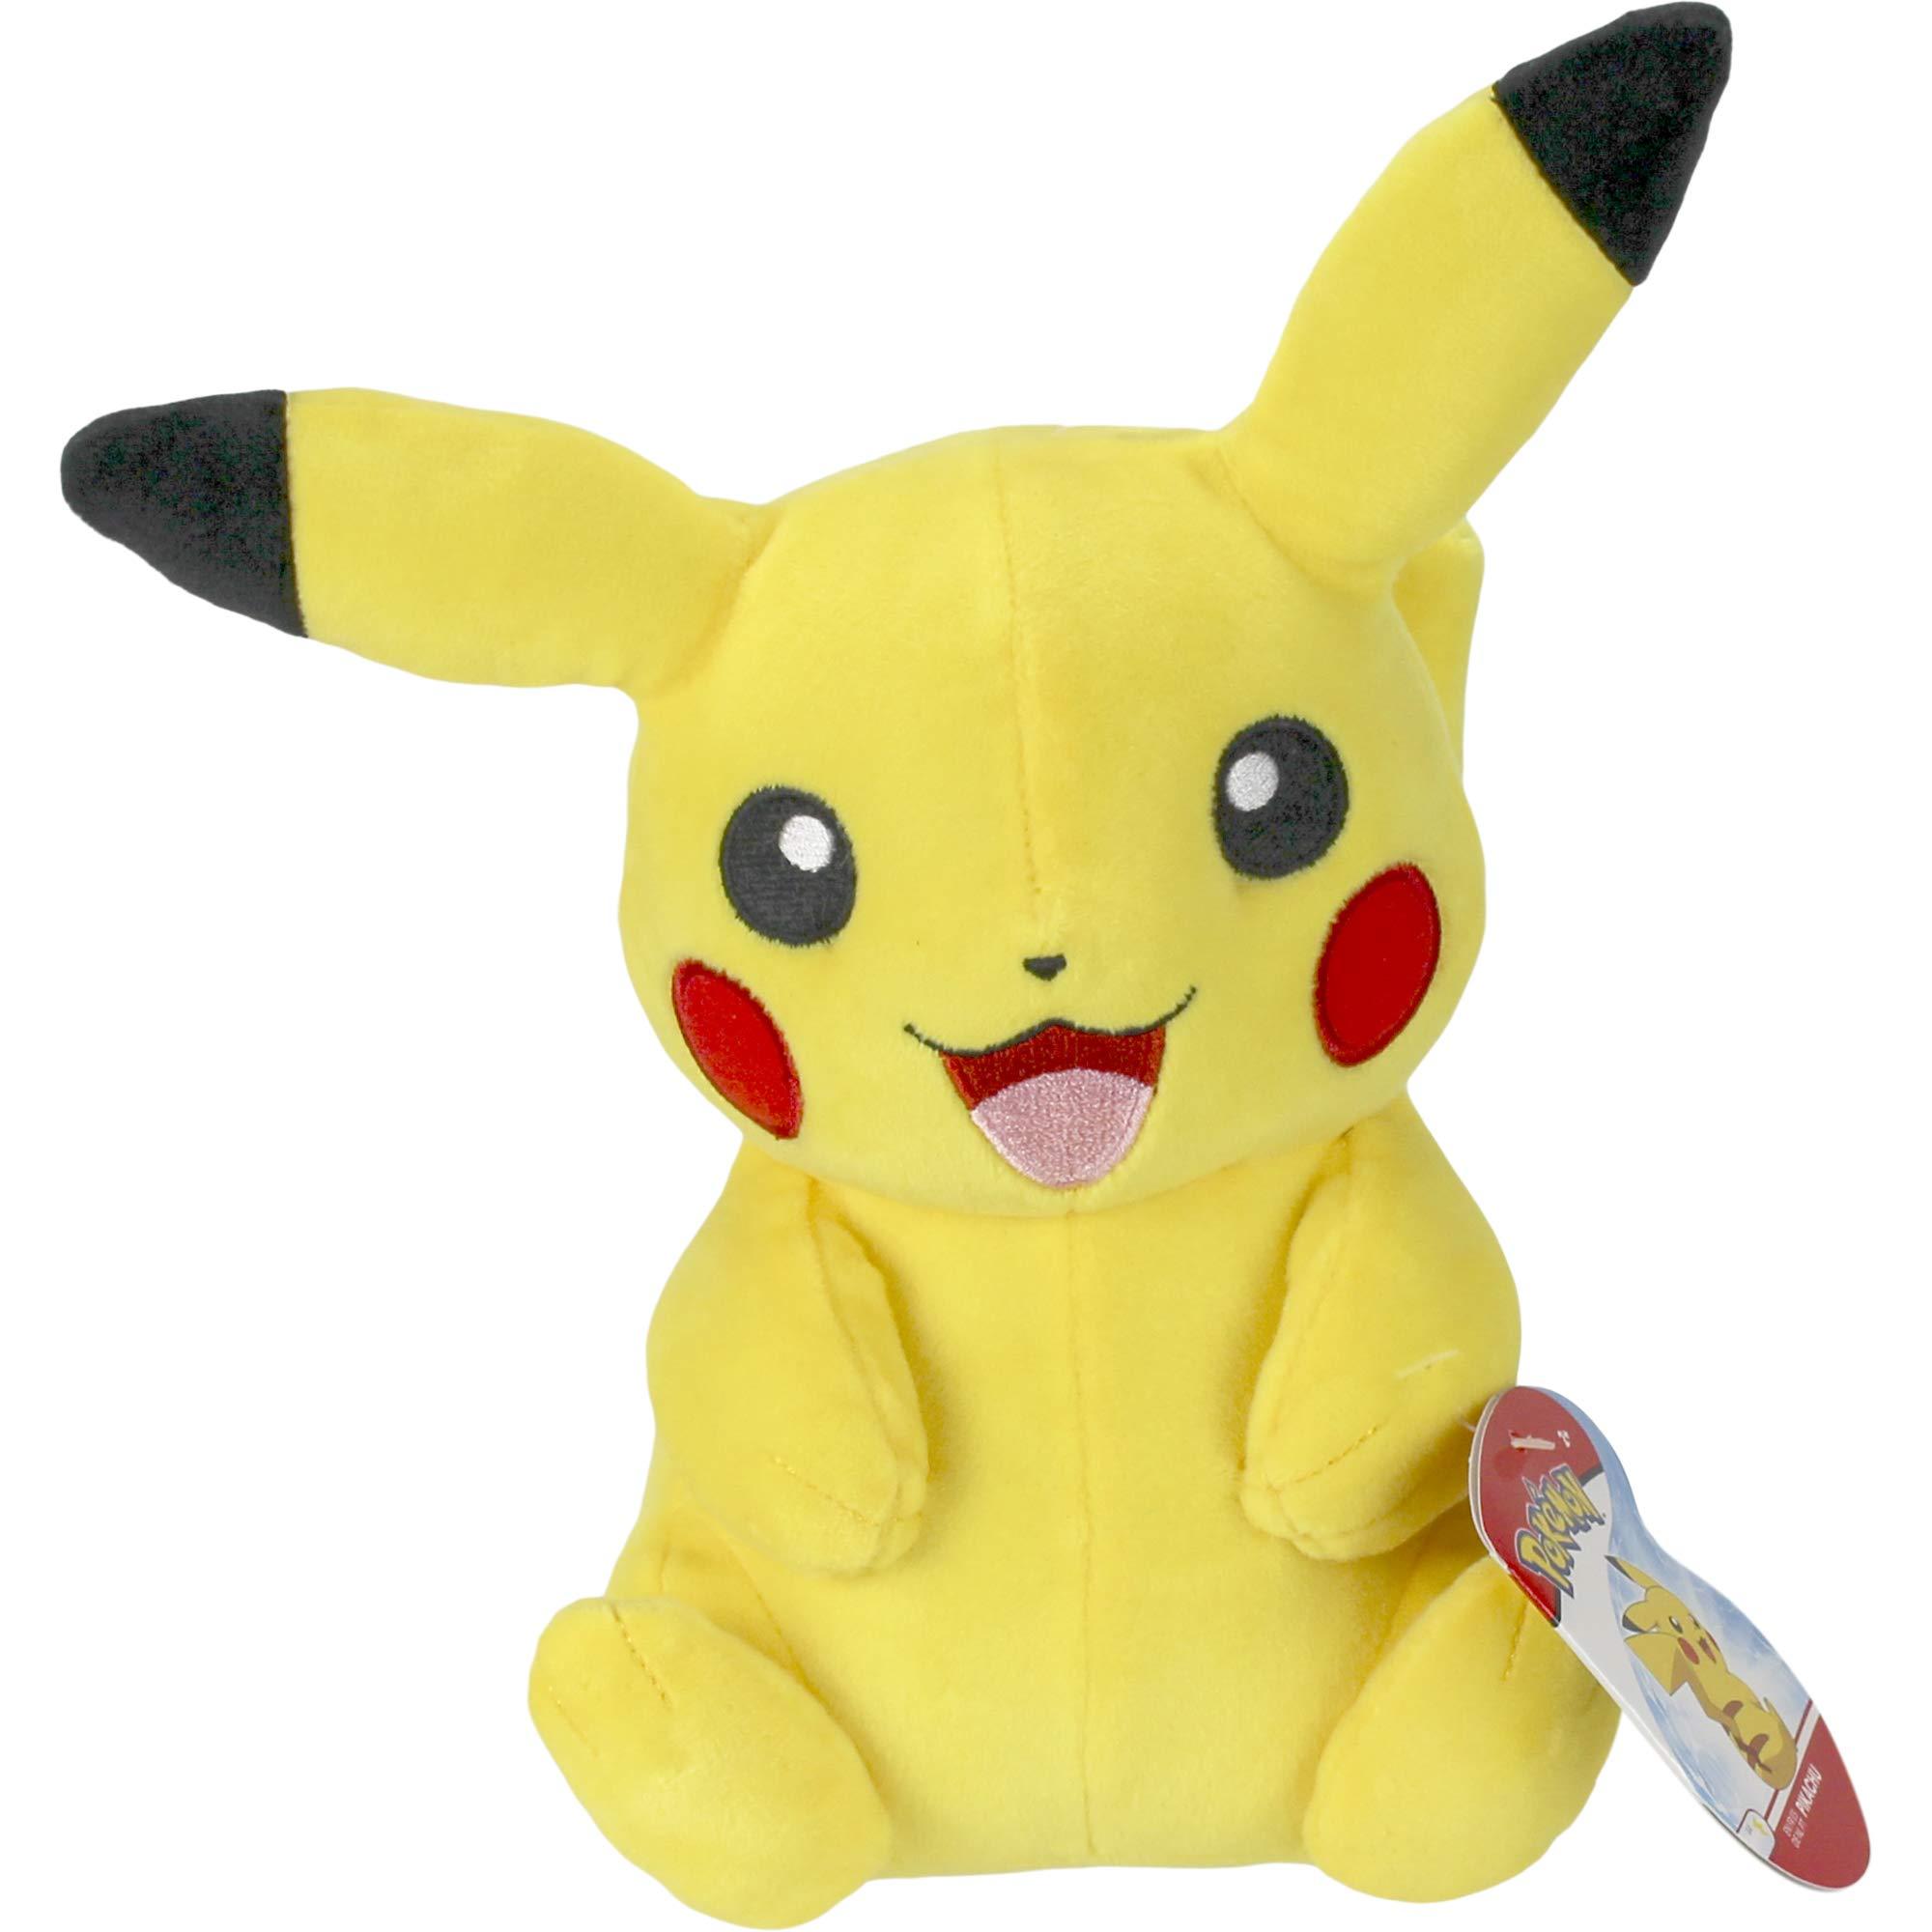 Pokémon Official & Premium Quality 8'' Plush - Pikachu by Pokemon